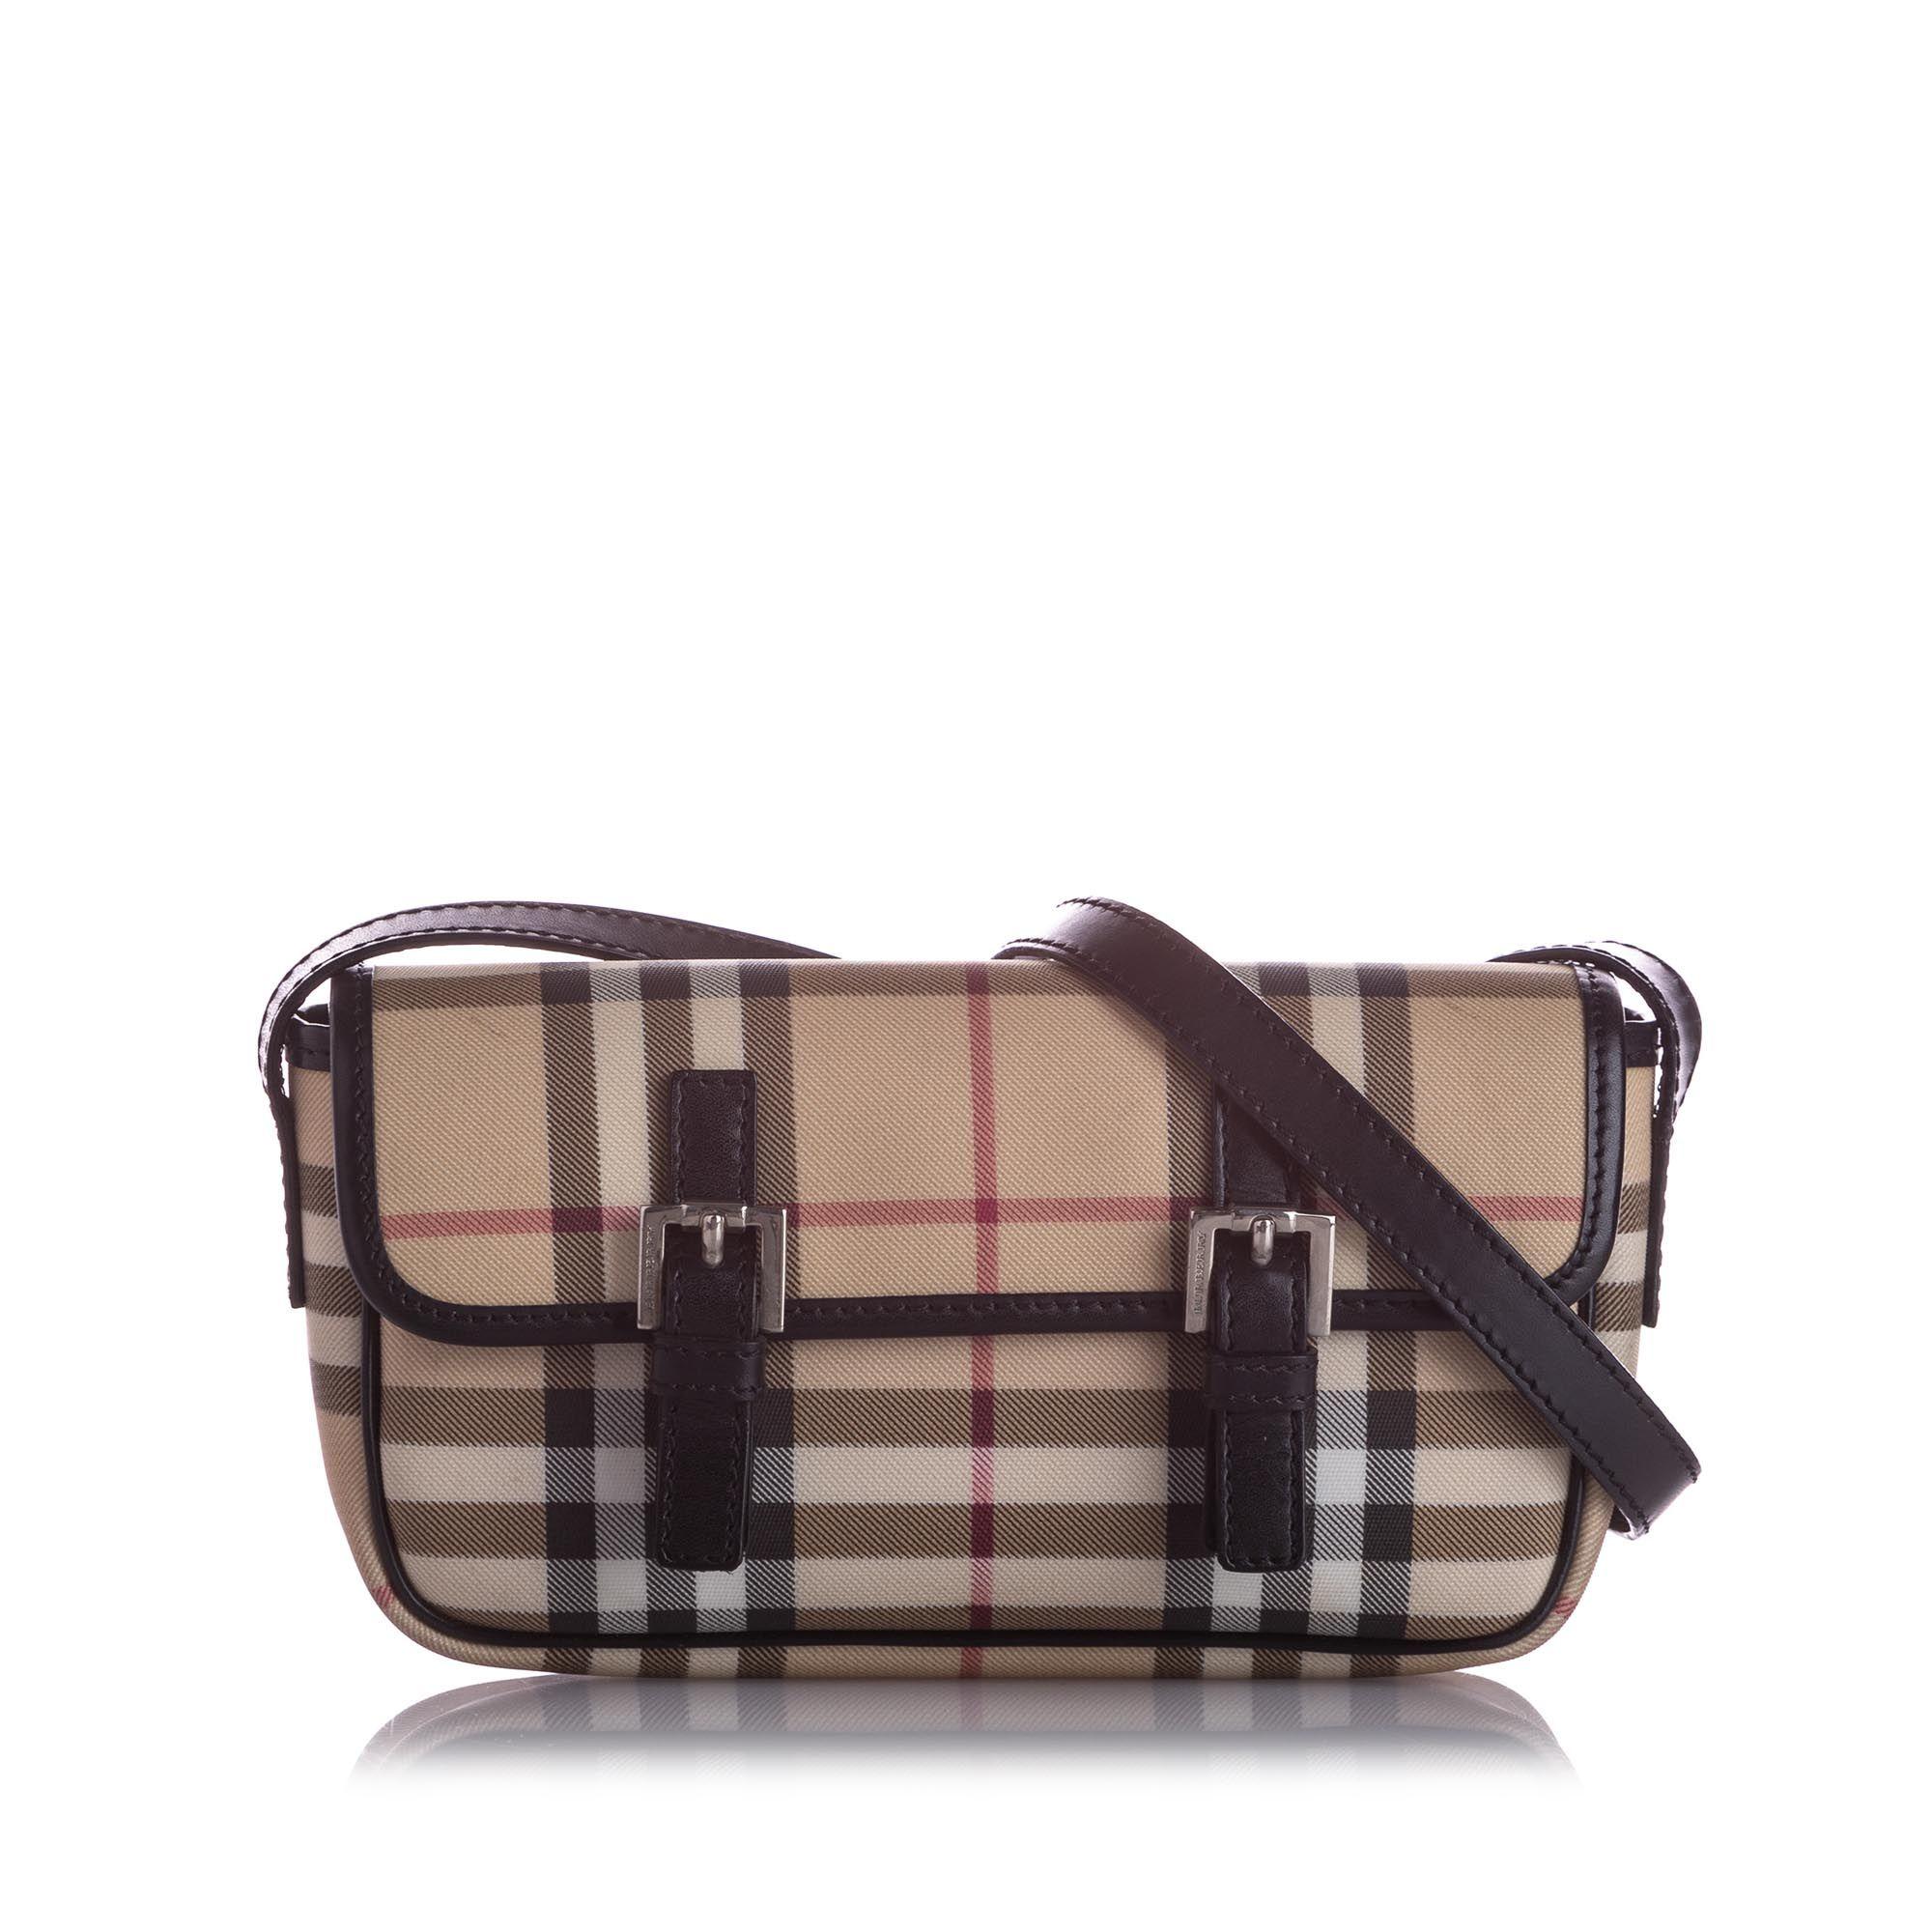 Vintage Burberry House Check Crossbody Bag Brown